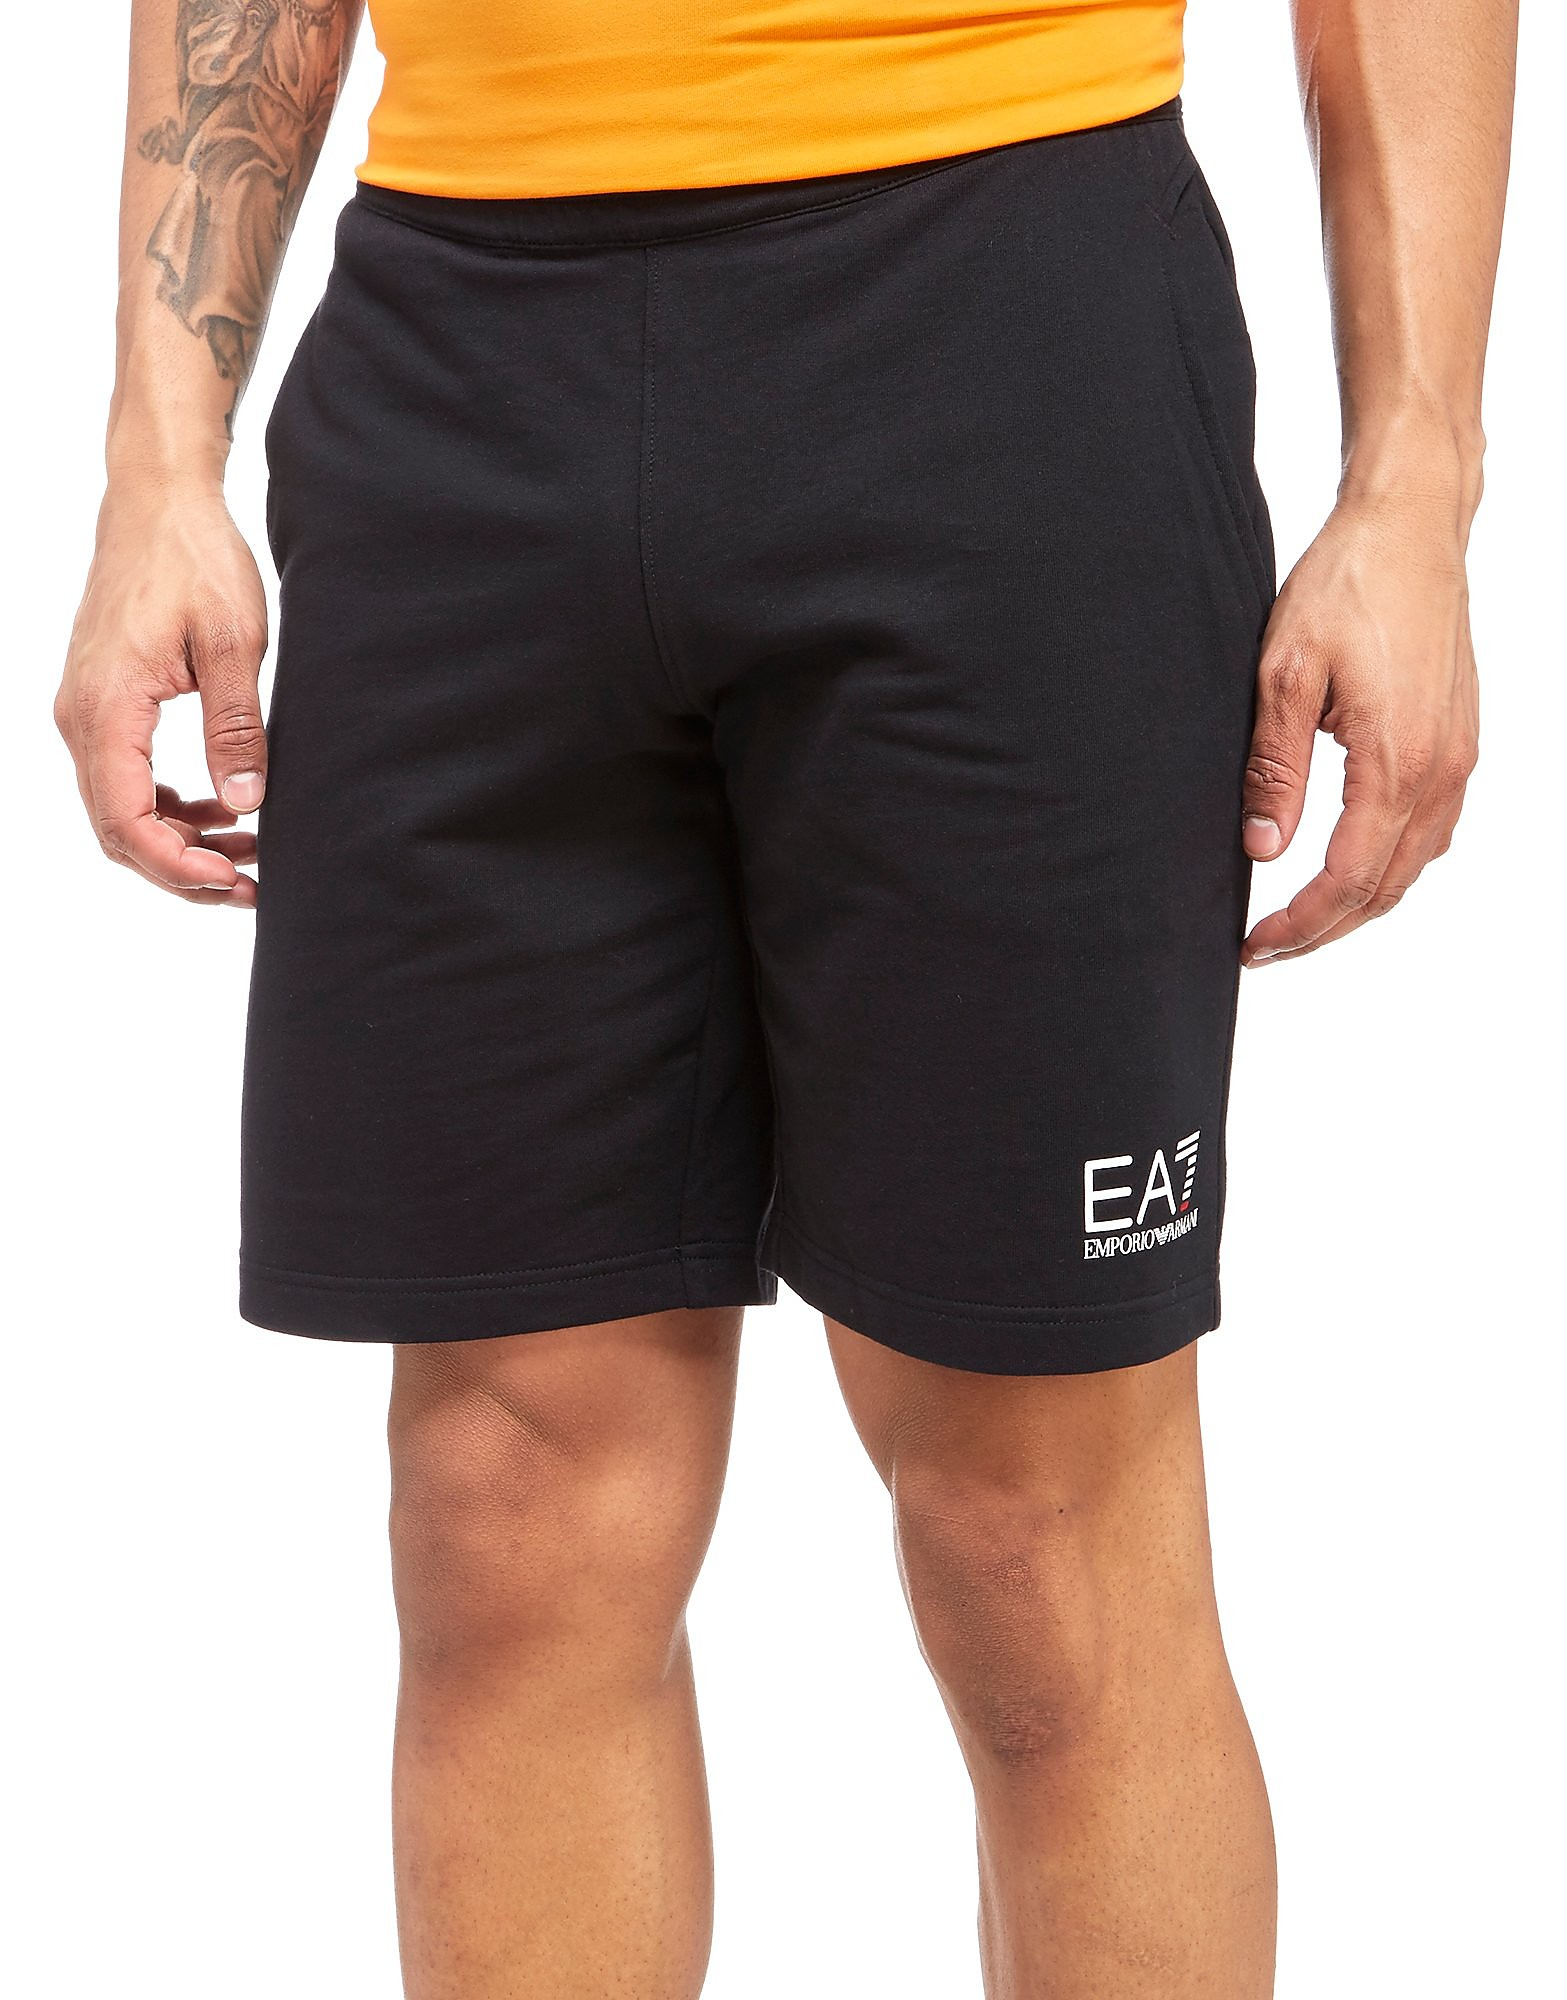 Emporio Armani EA7 Core FT Shorts